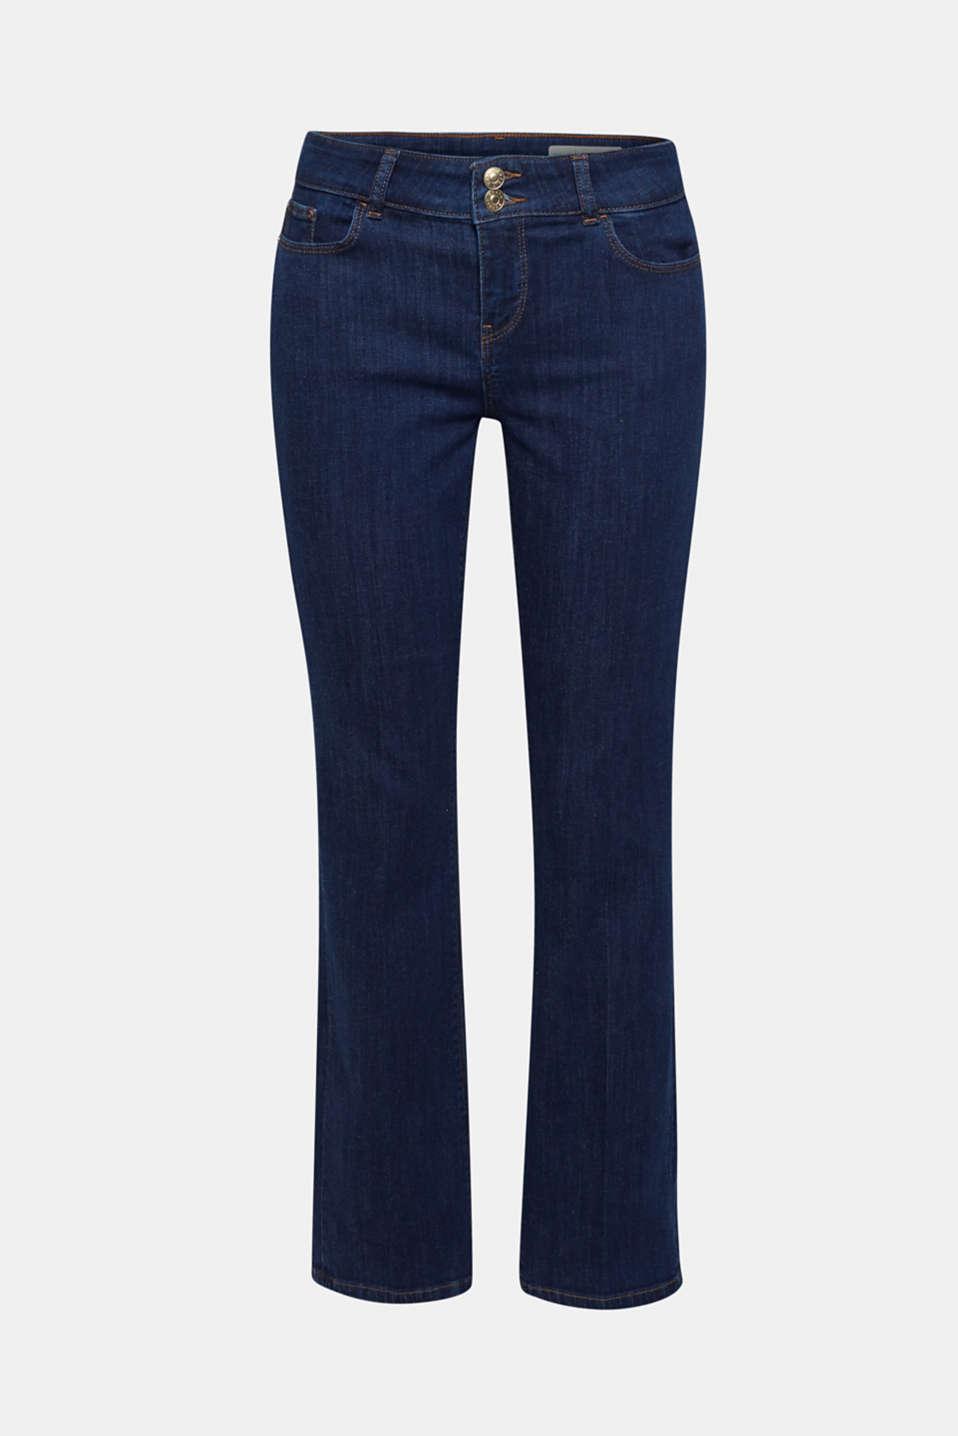 Pants denim, BLUE RINSE, detail image number 8